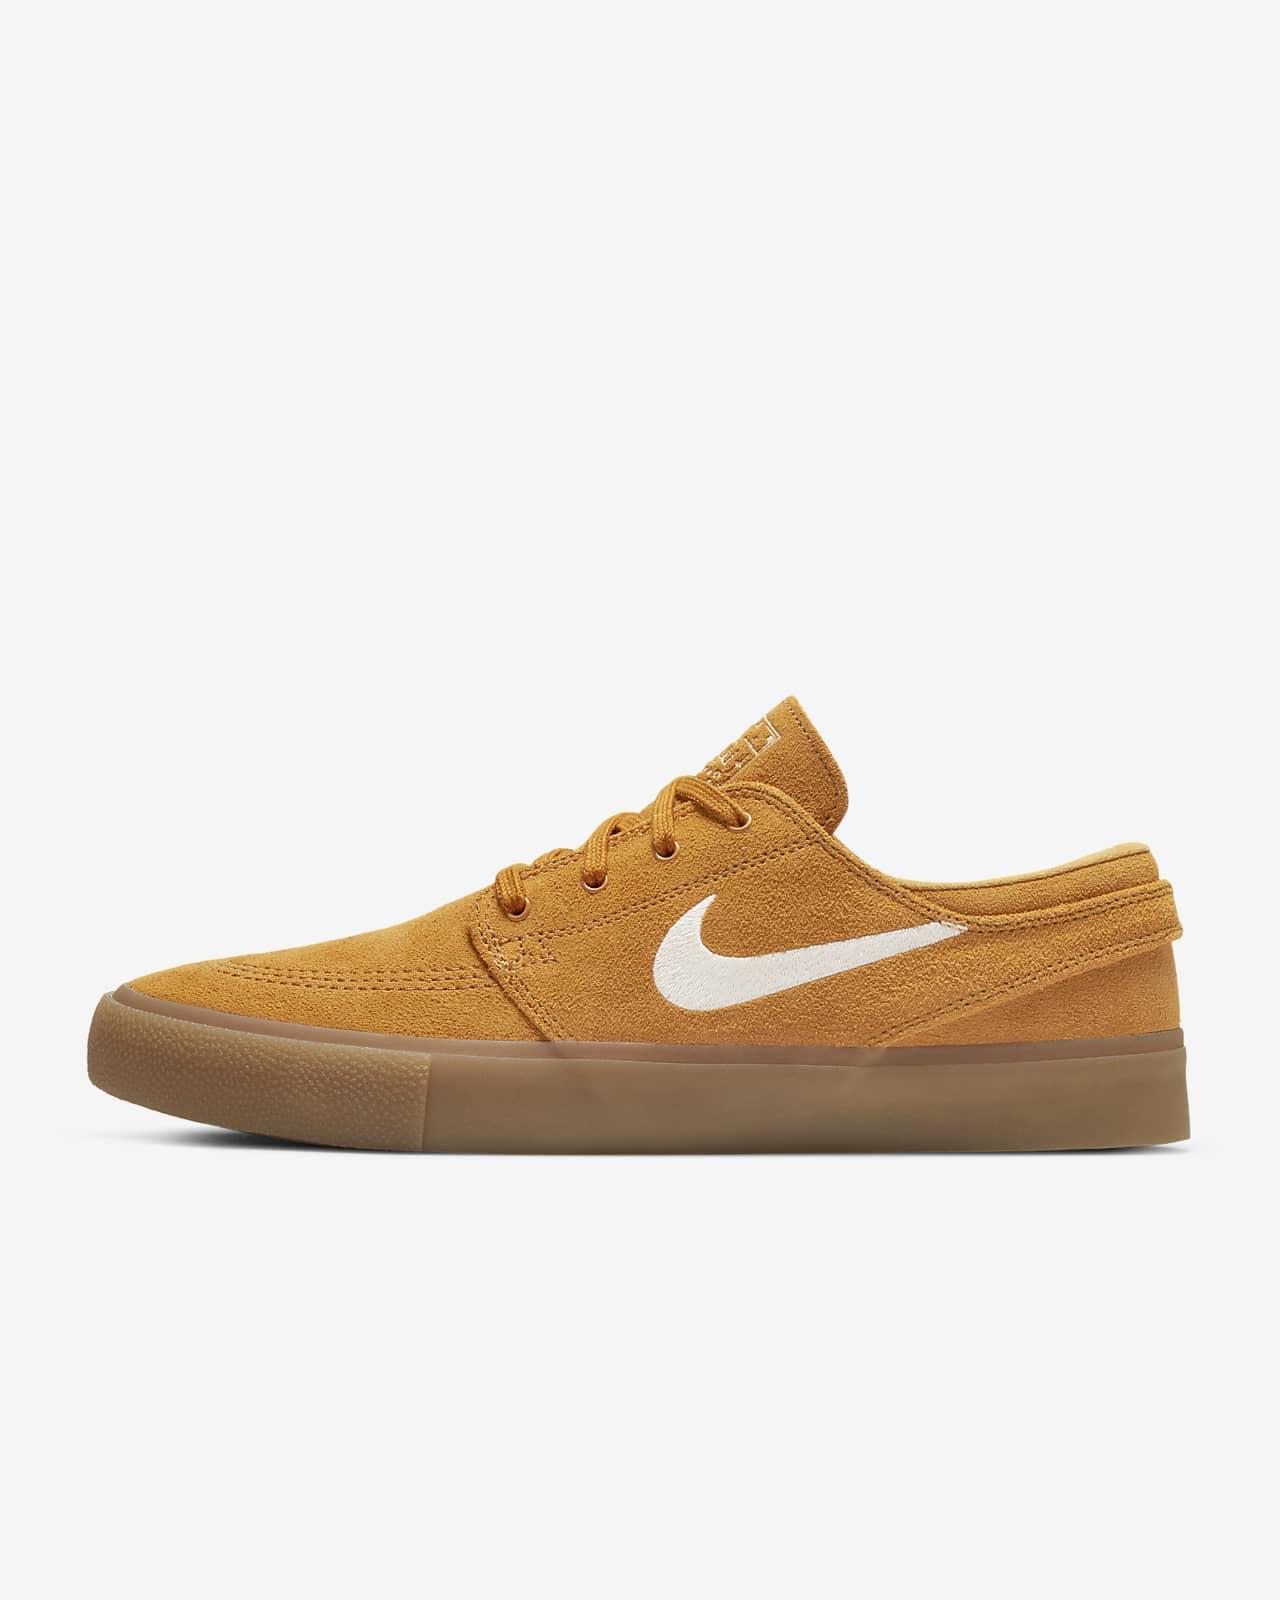 Skateboardová bota Nike SB Zoom Stefan Janoski RM